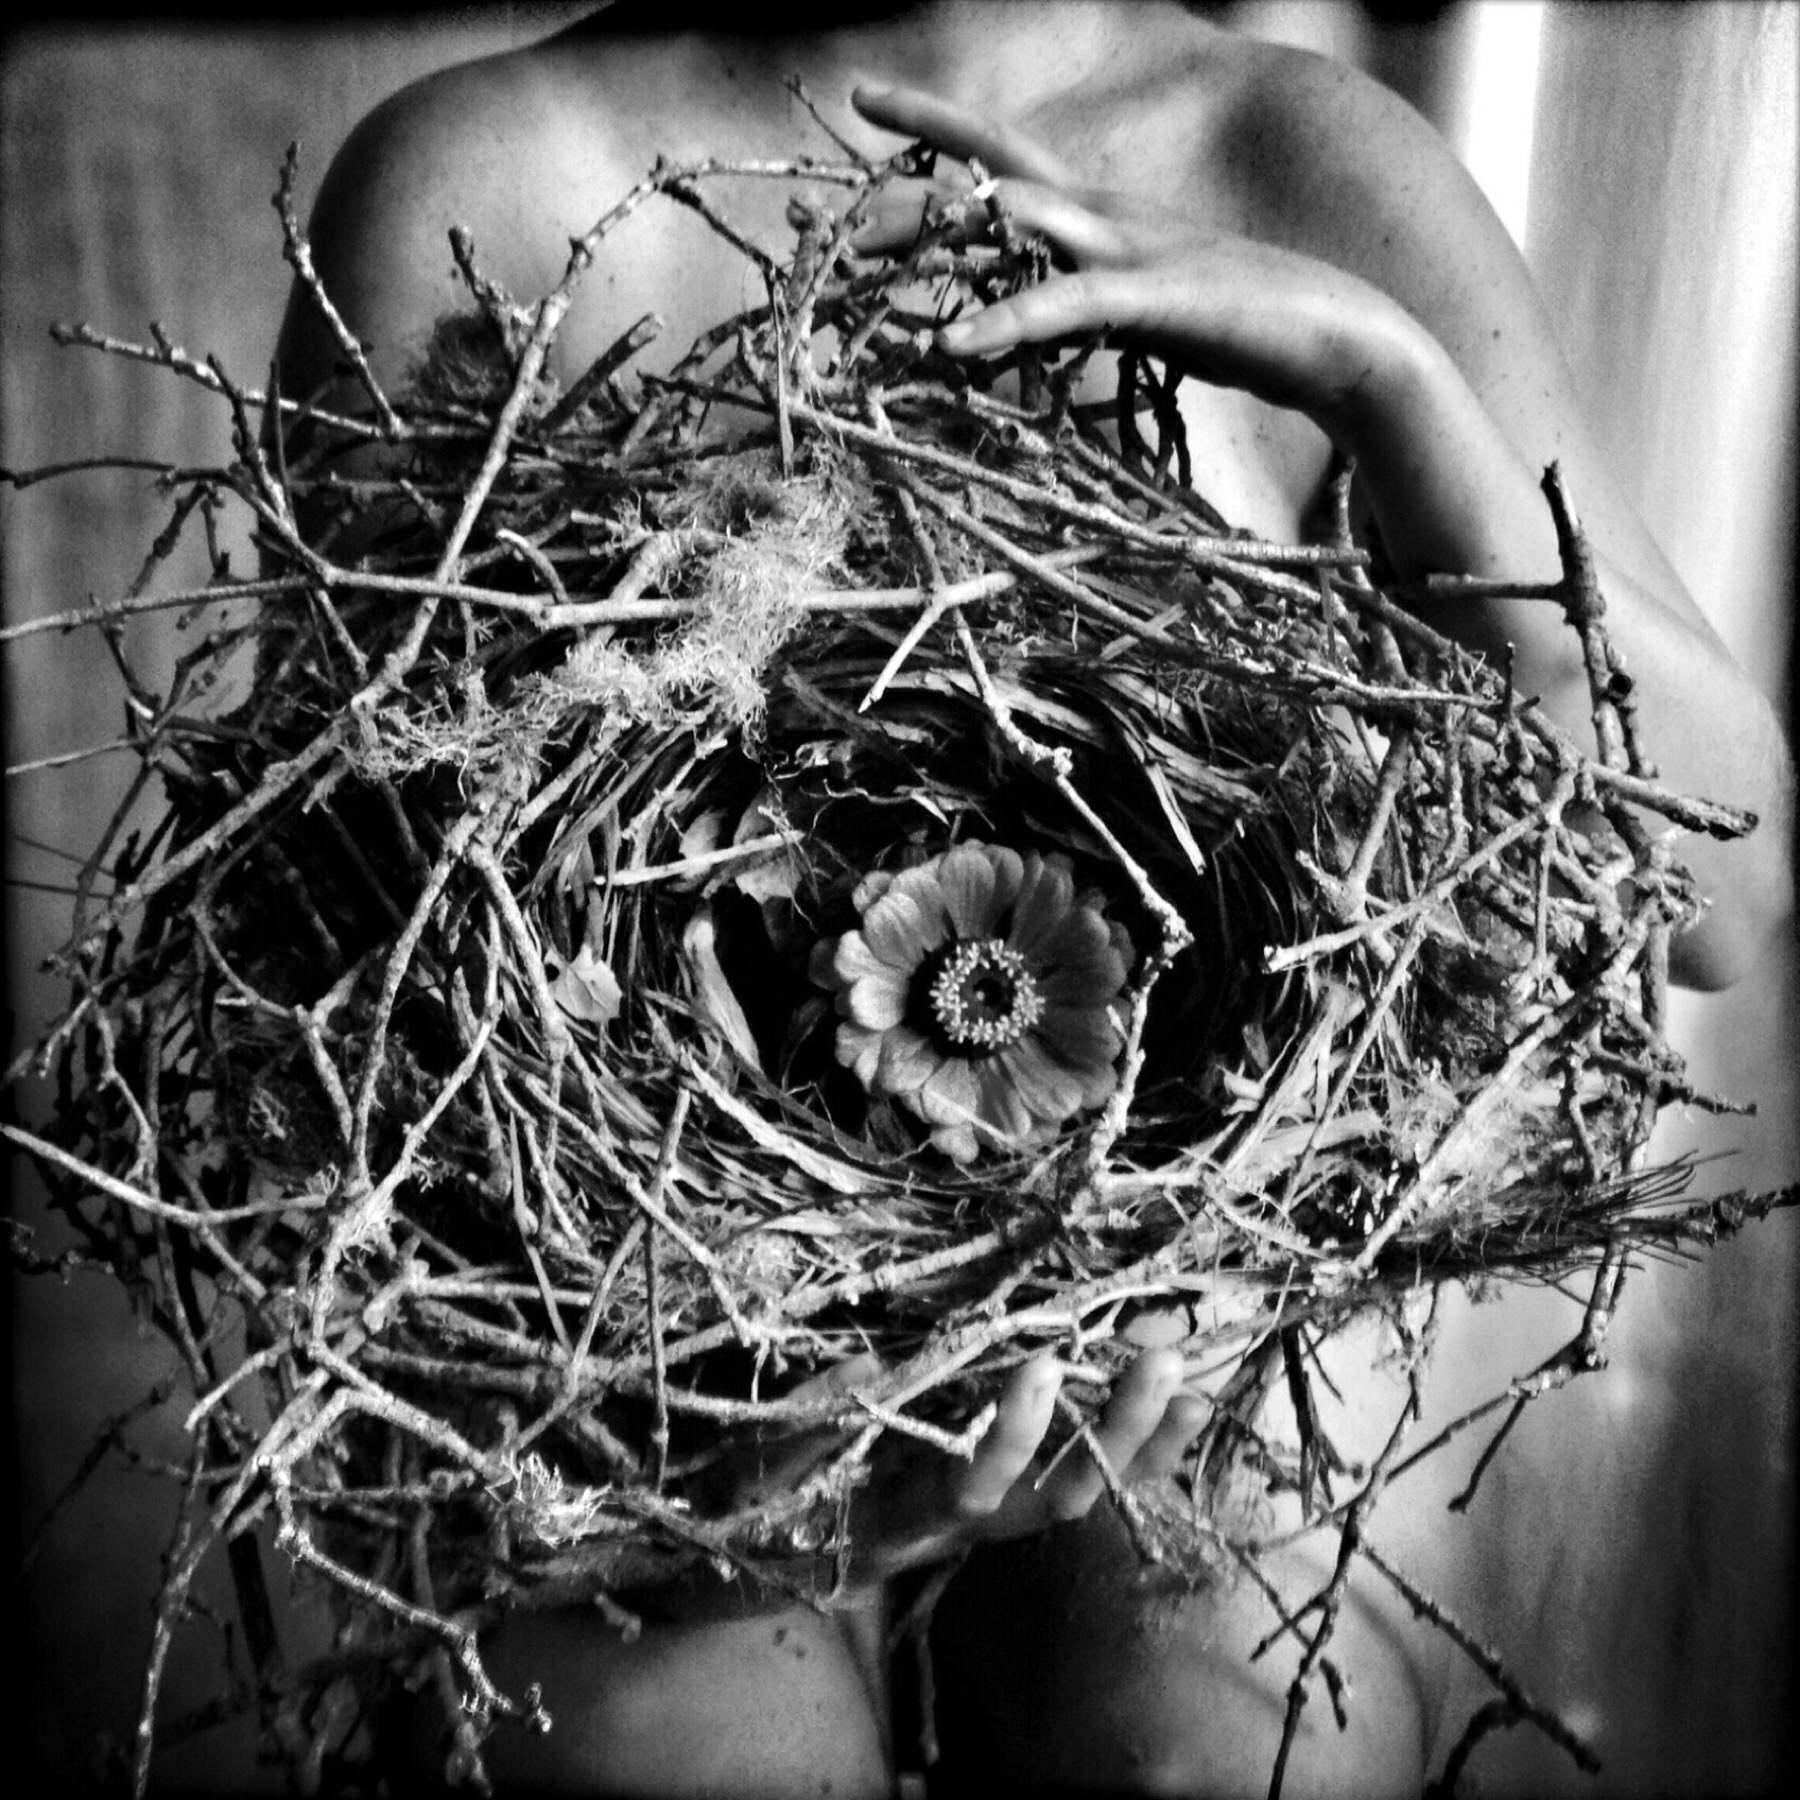 The Nest, 2015